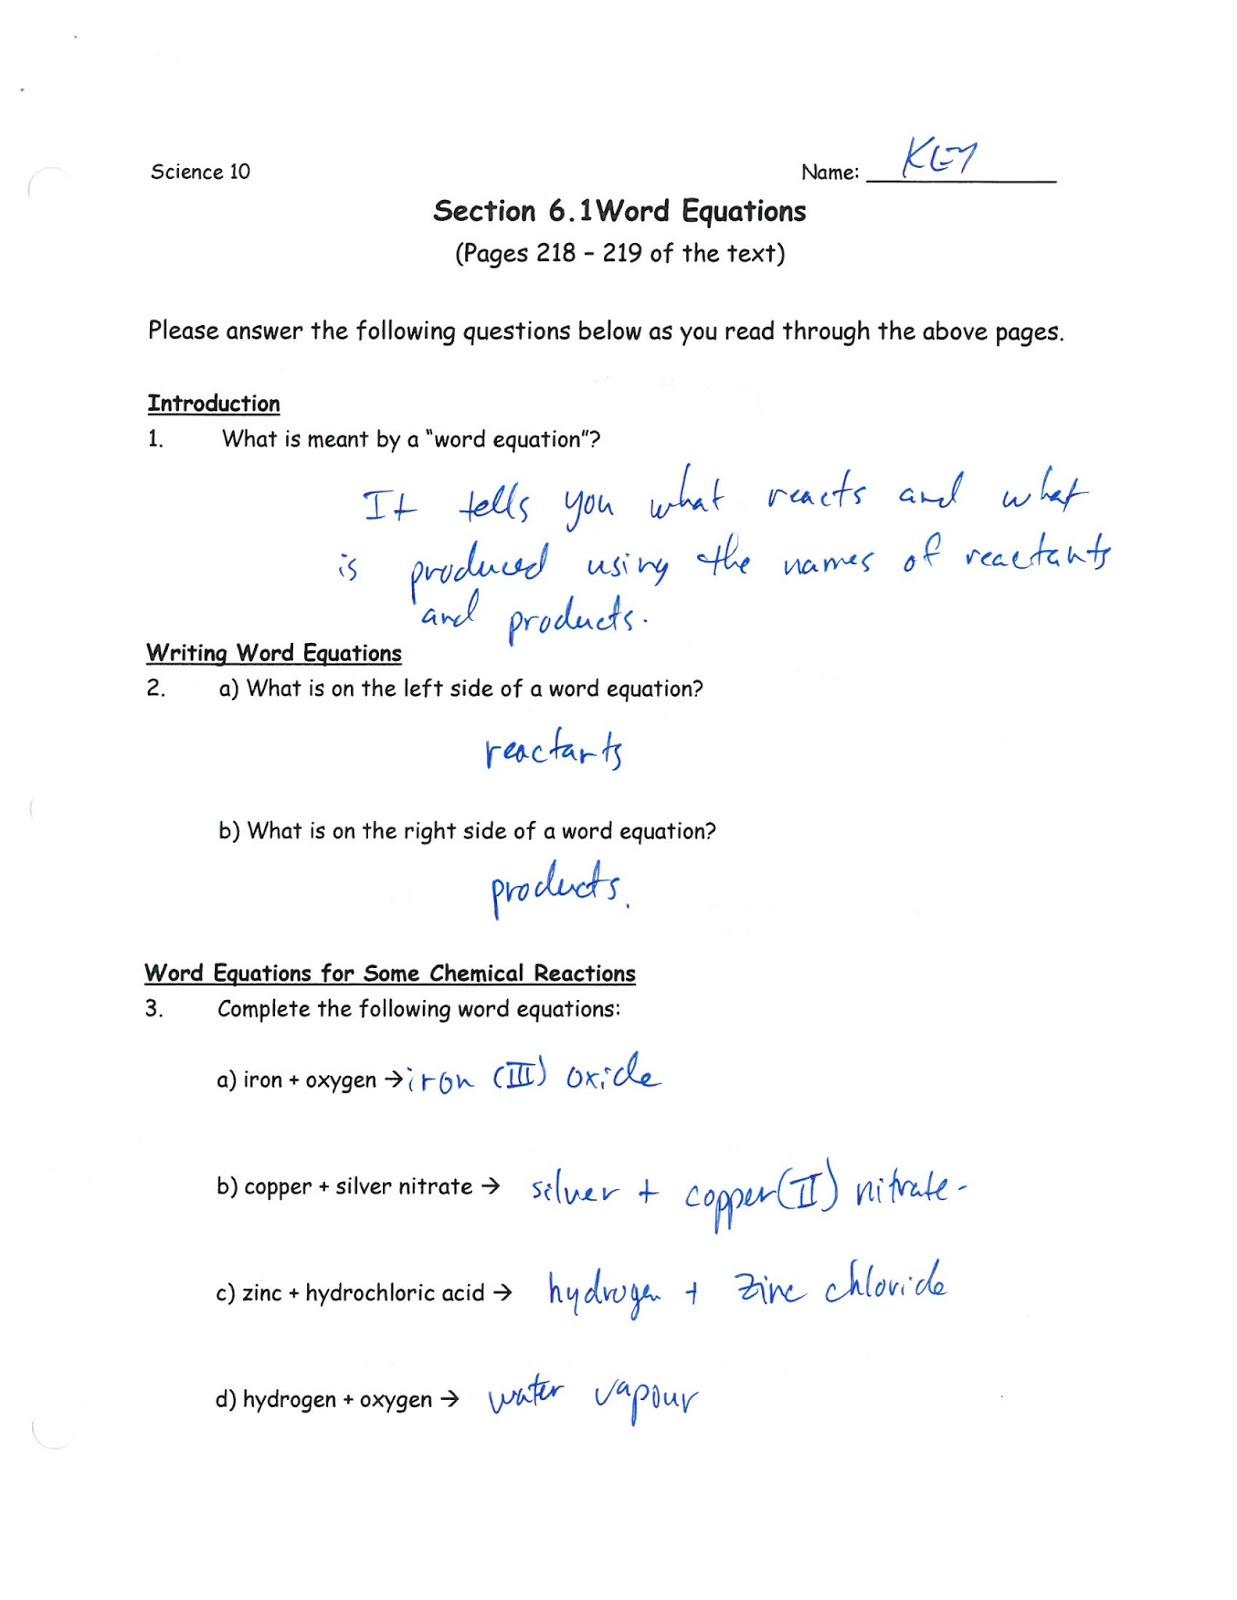 Nuclear Equations Worksheet Answers Balancing Equations Worksheet for Grade 7 with Answers